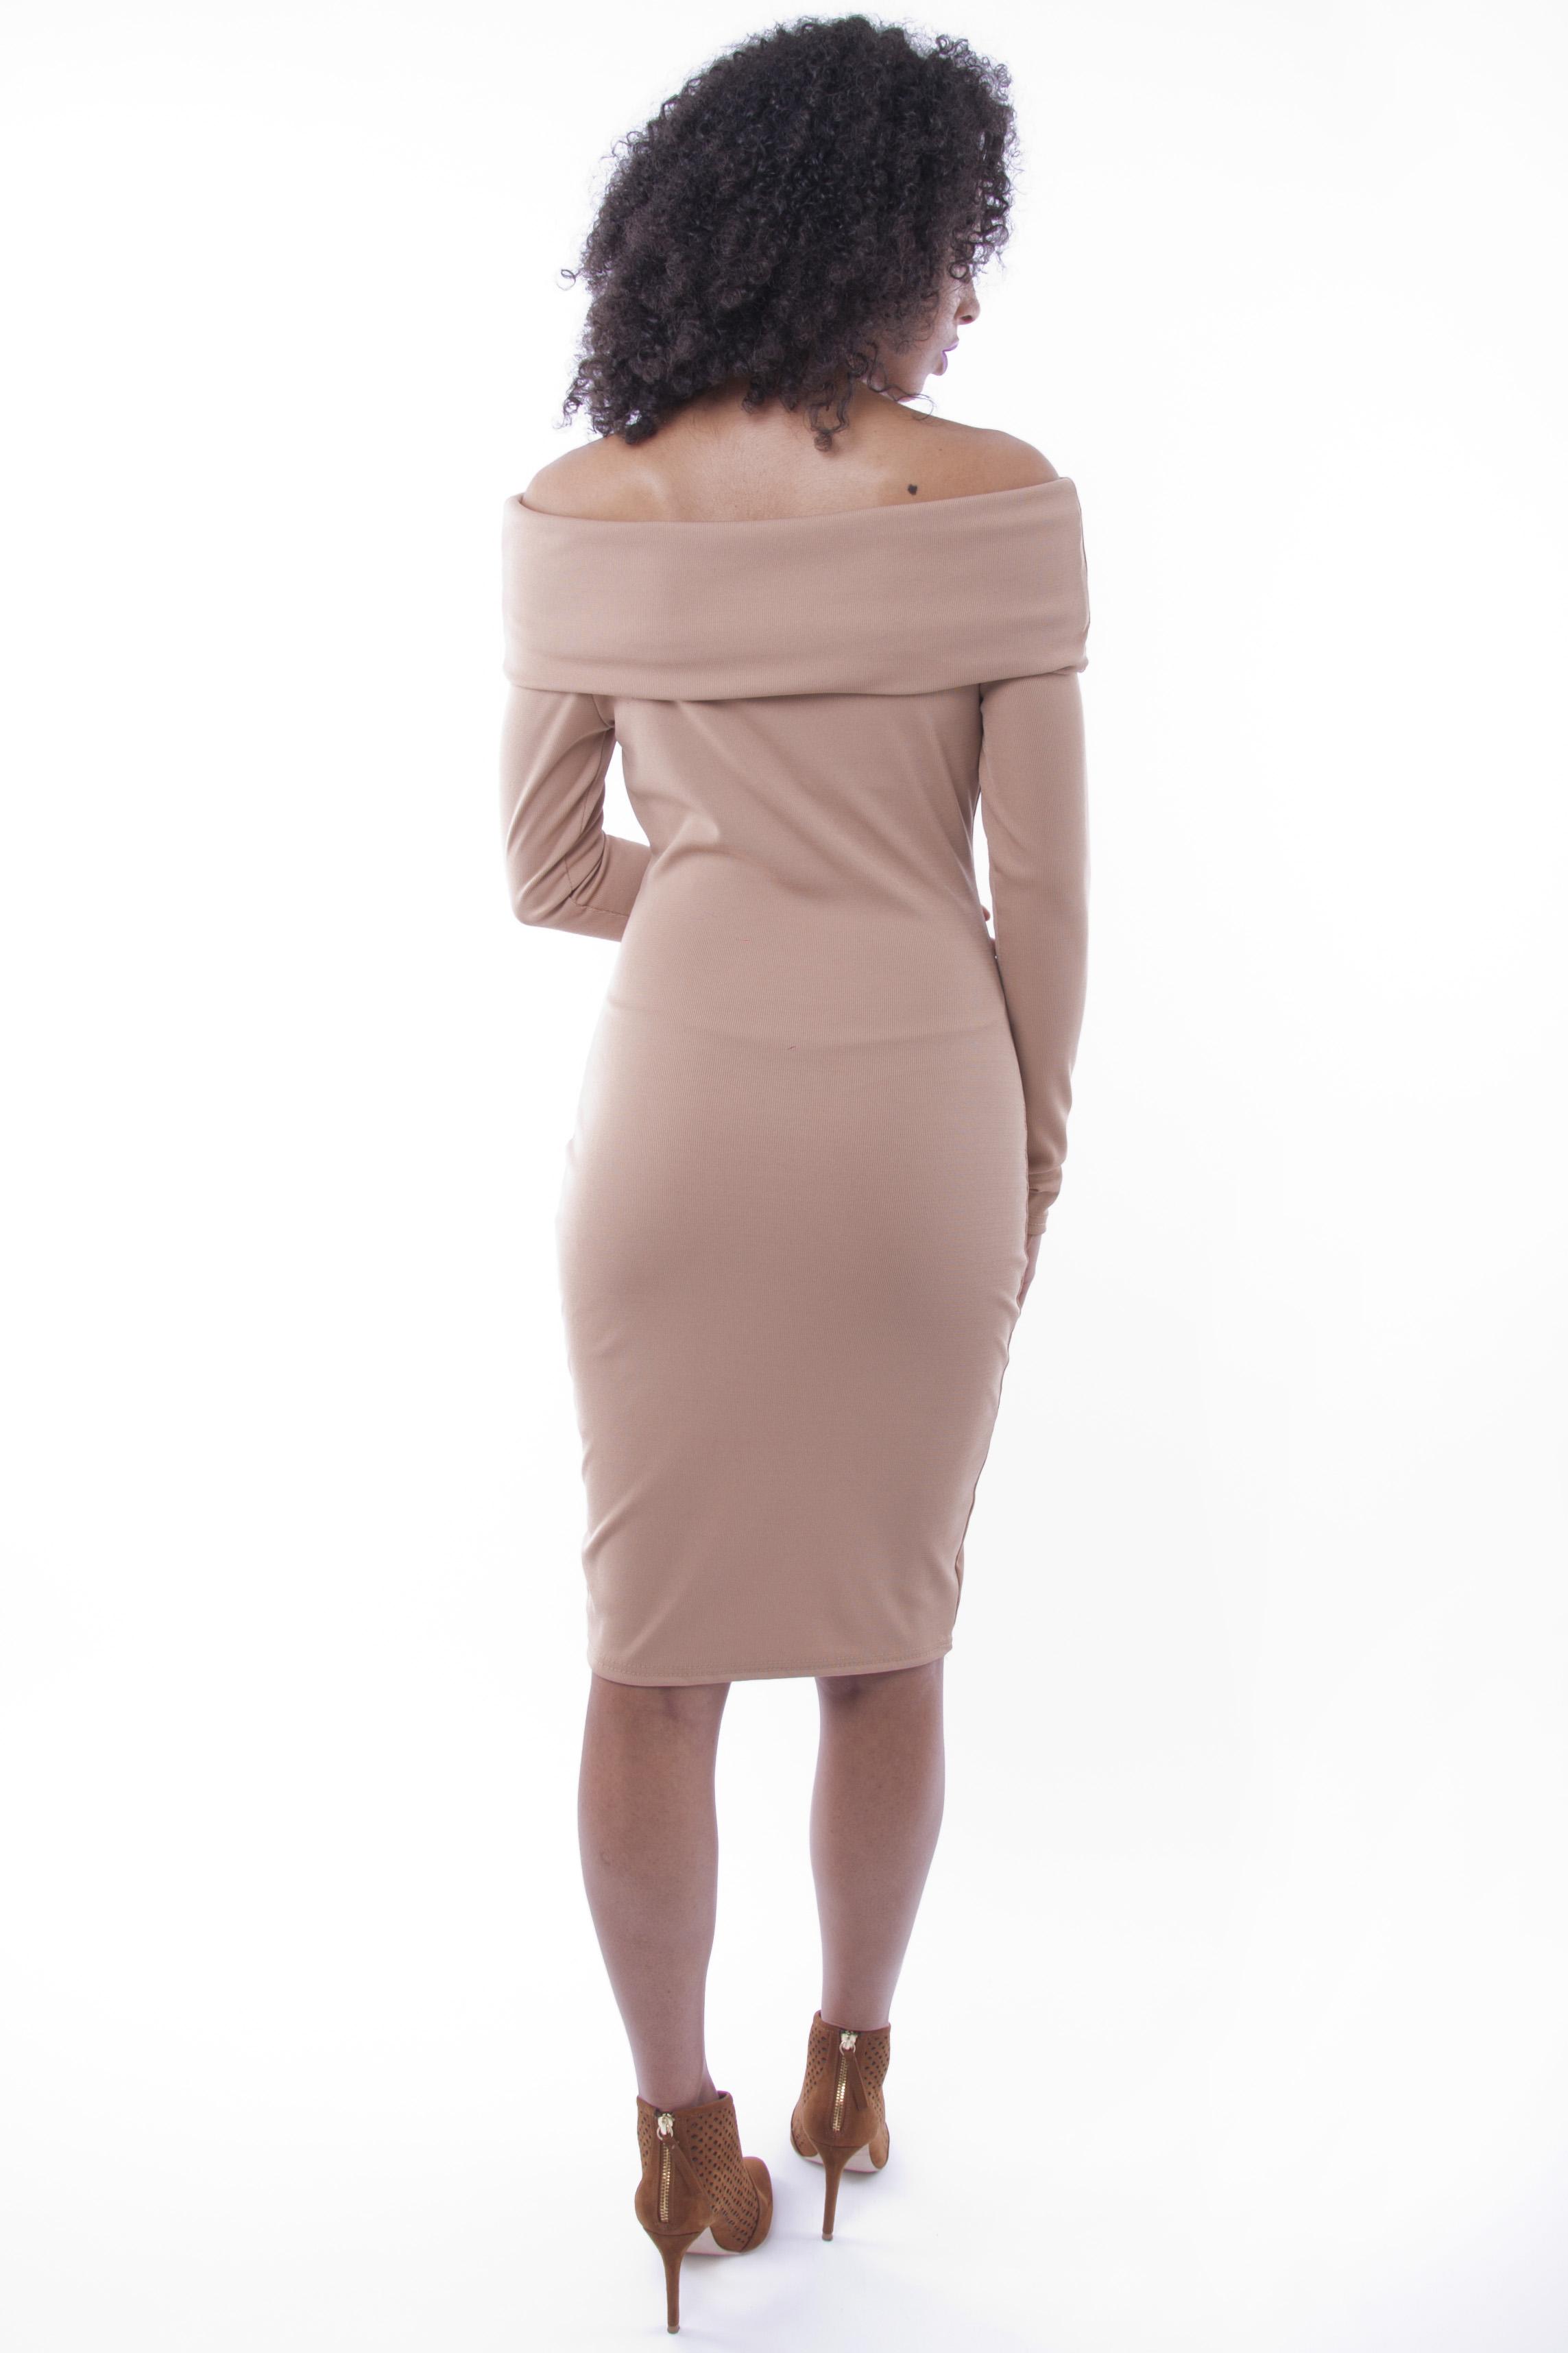 Ladies Cut Out Neck Diamond Floral Print Women/'s Midi Stretch Bodycon Dress 8-14